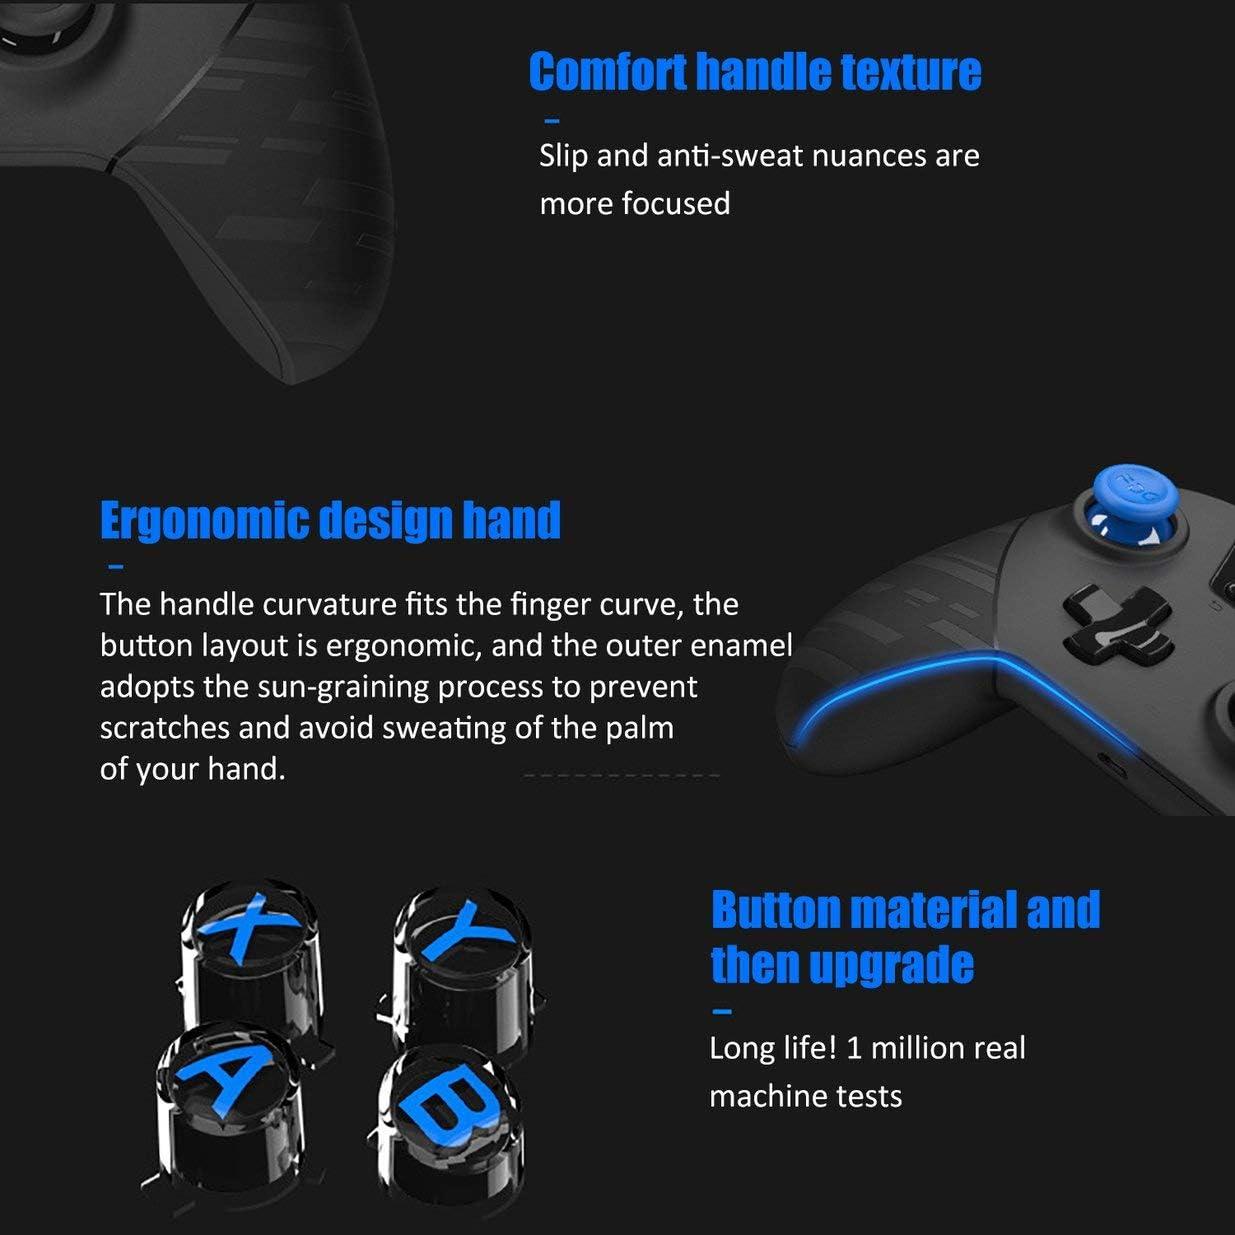 Sairis FlyDigi X8 Pro 2.4Ghz Wireless Controller Wireless Gamepad for Android//iOS